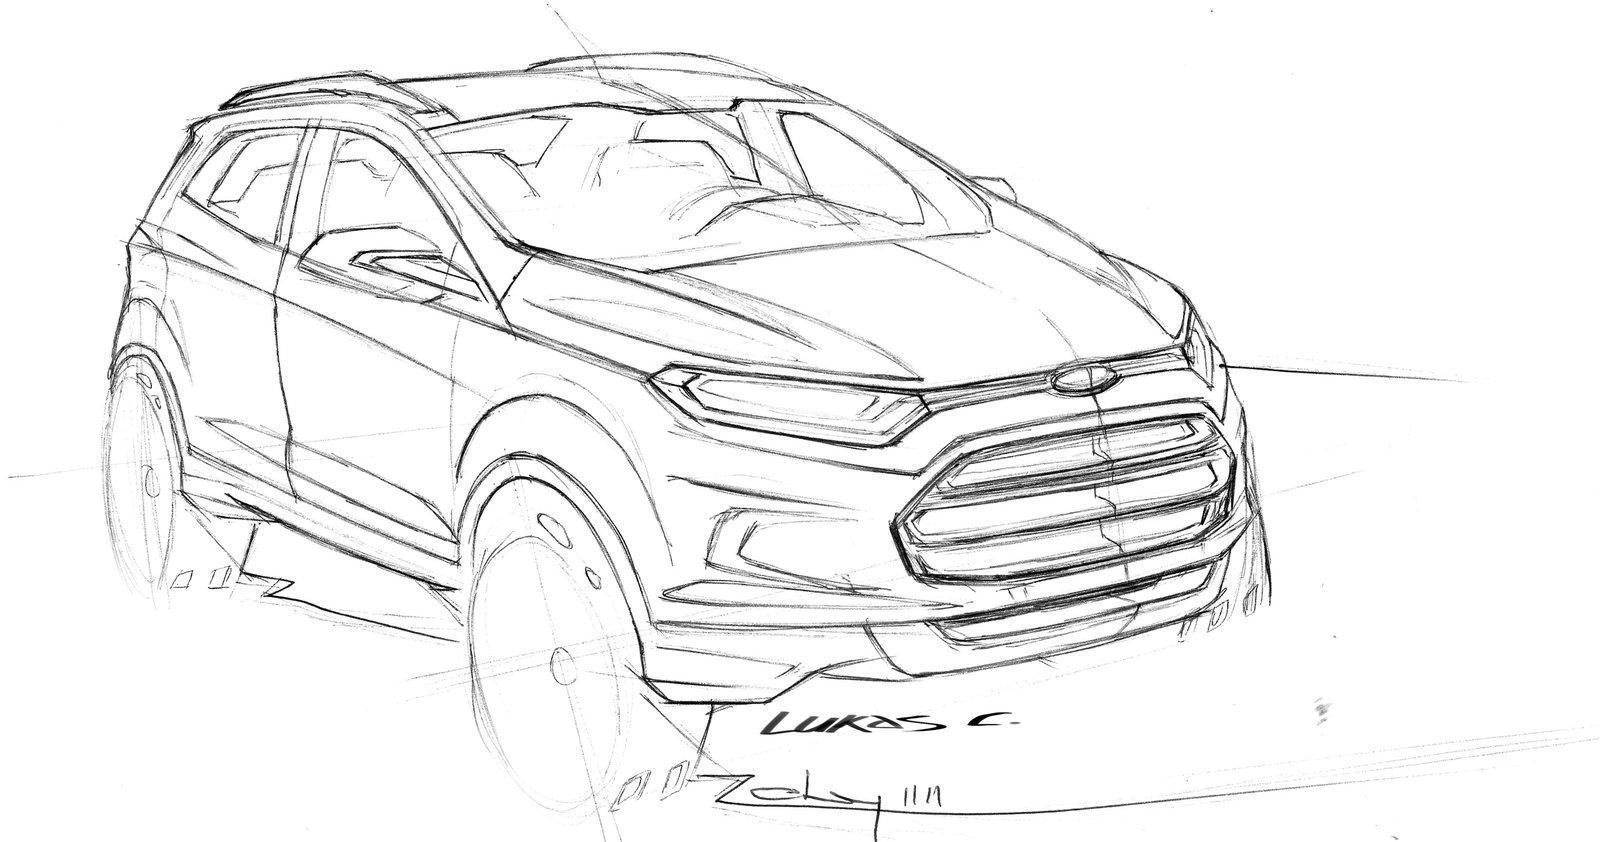 youngmanblog: Ford EcoSport compact SUV